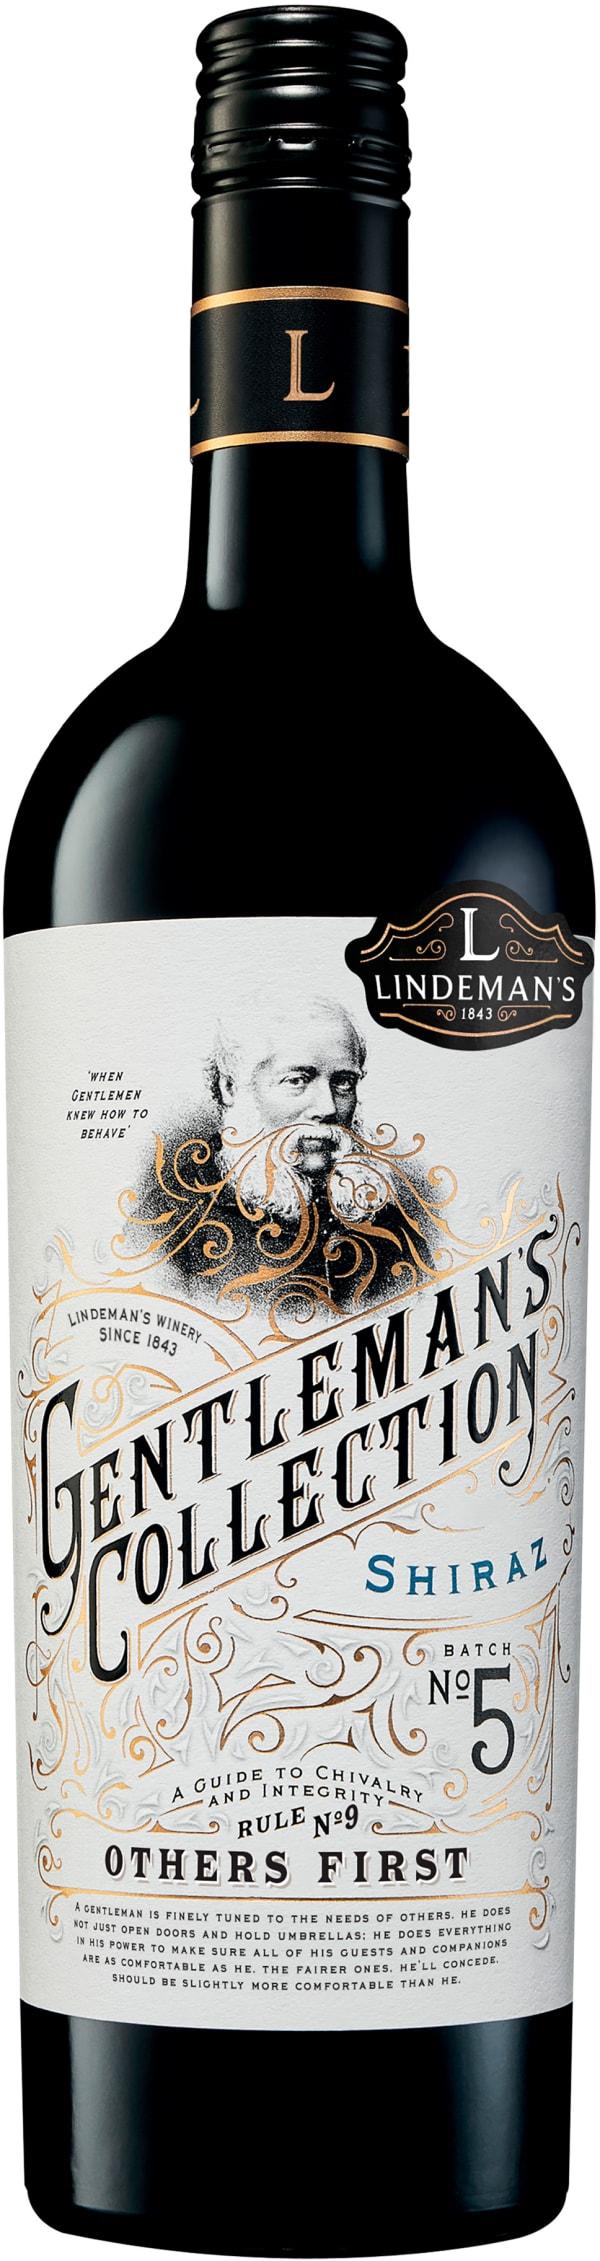 Lindeman's Gentlemans Collection Shiraz 2018